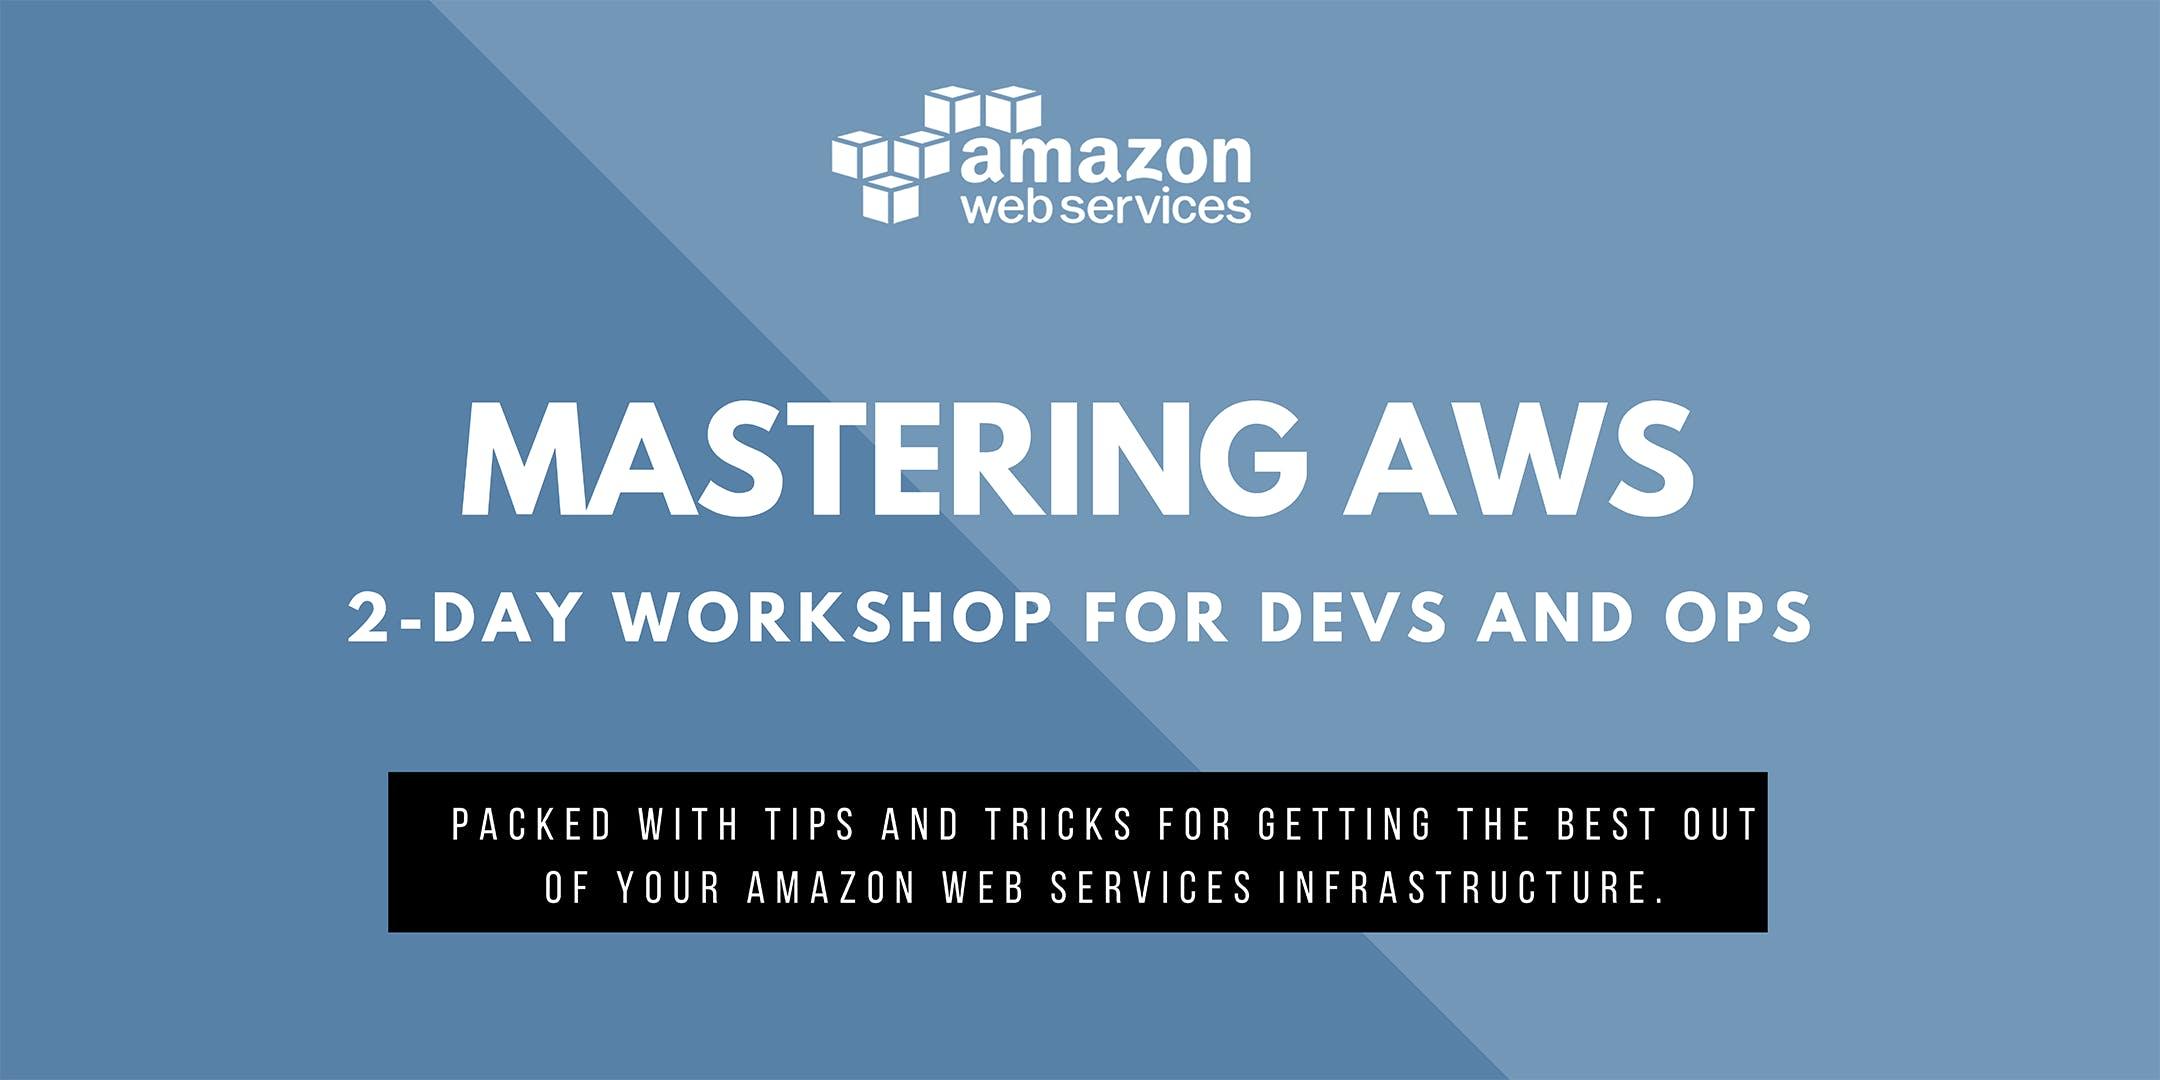 TOP Mastering Amazon Web Services (Kbenhavn)